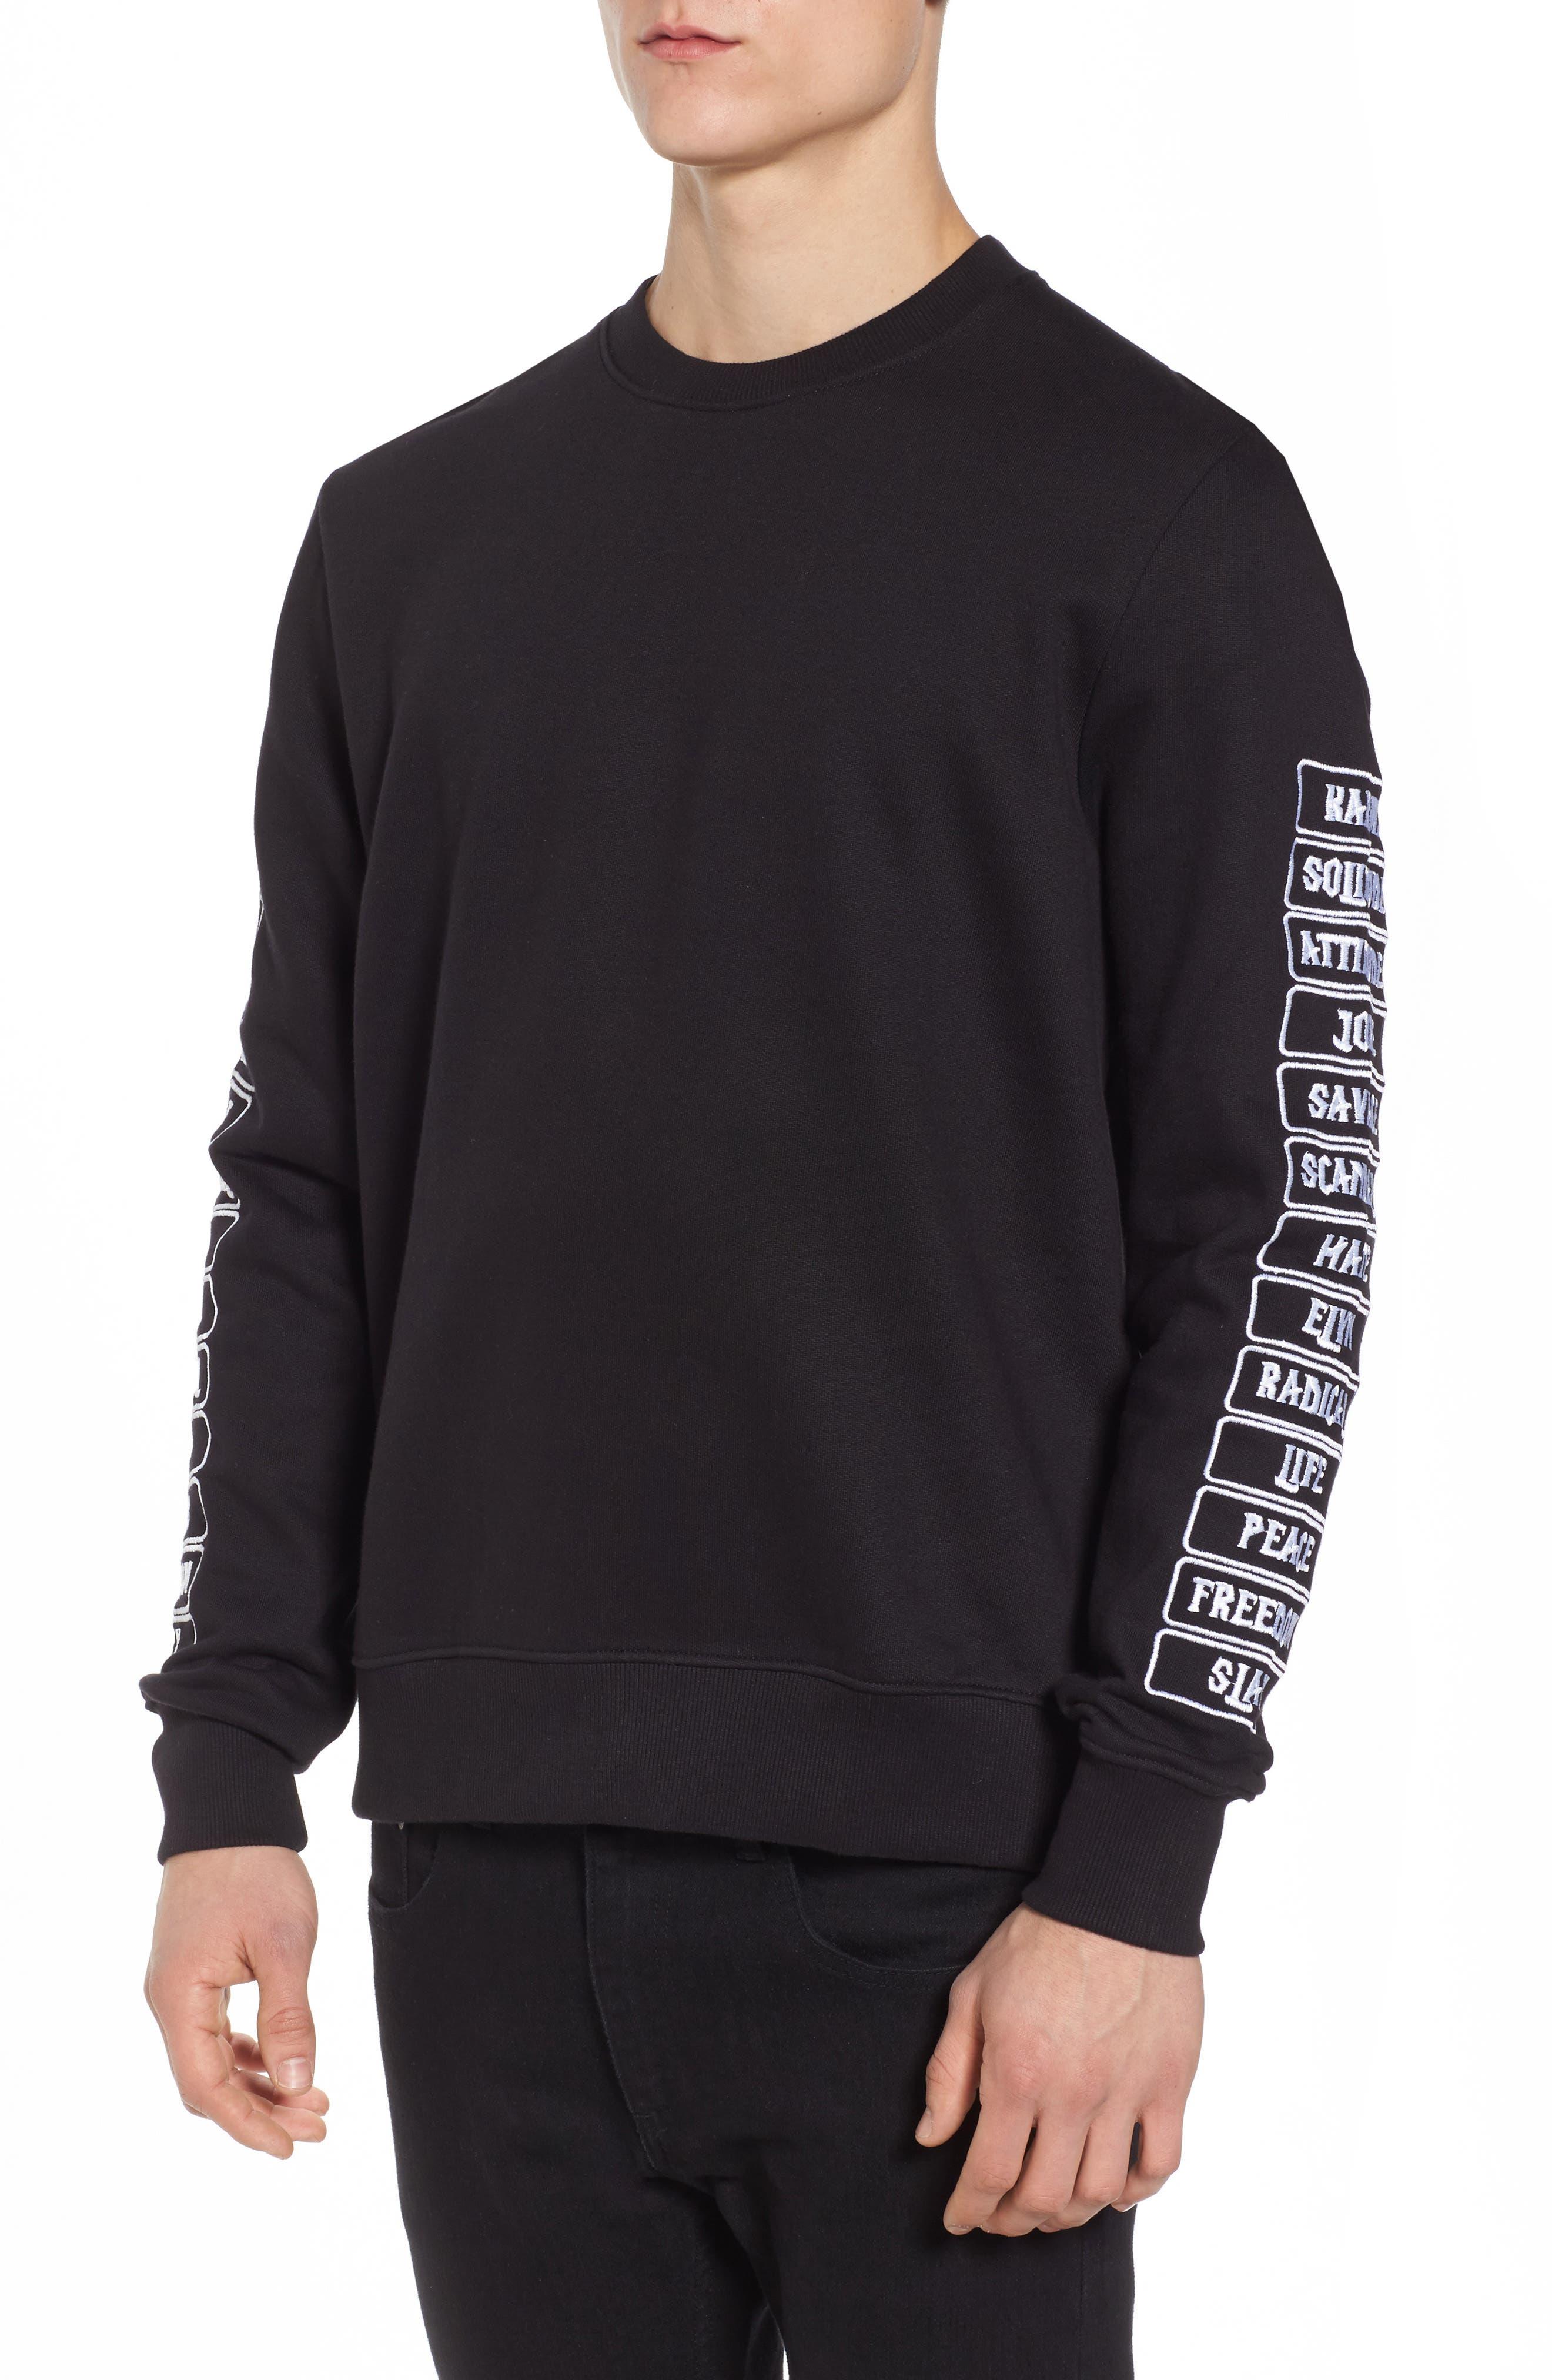 Meace Fleece Sweatshirt,                         Main,                         color, 002